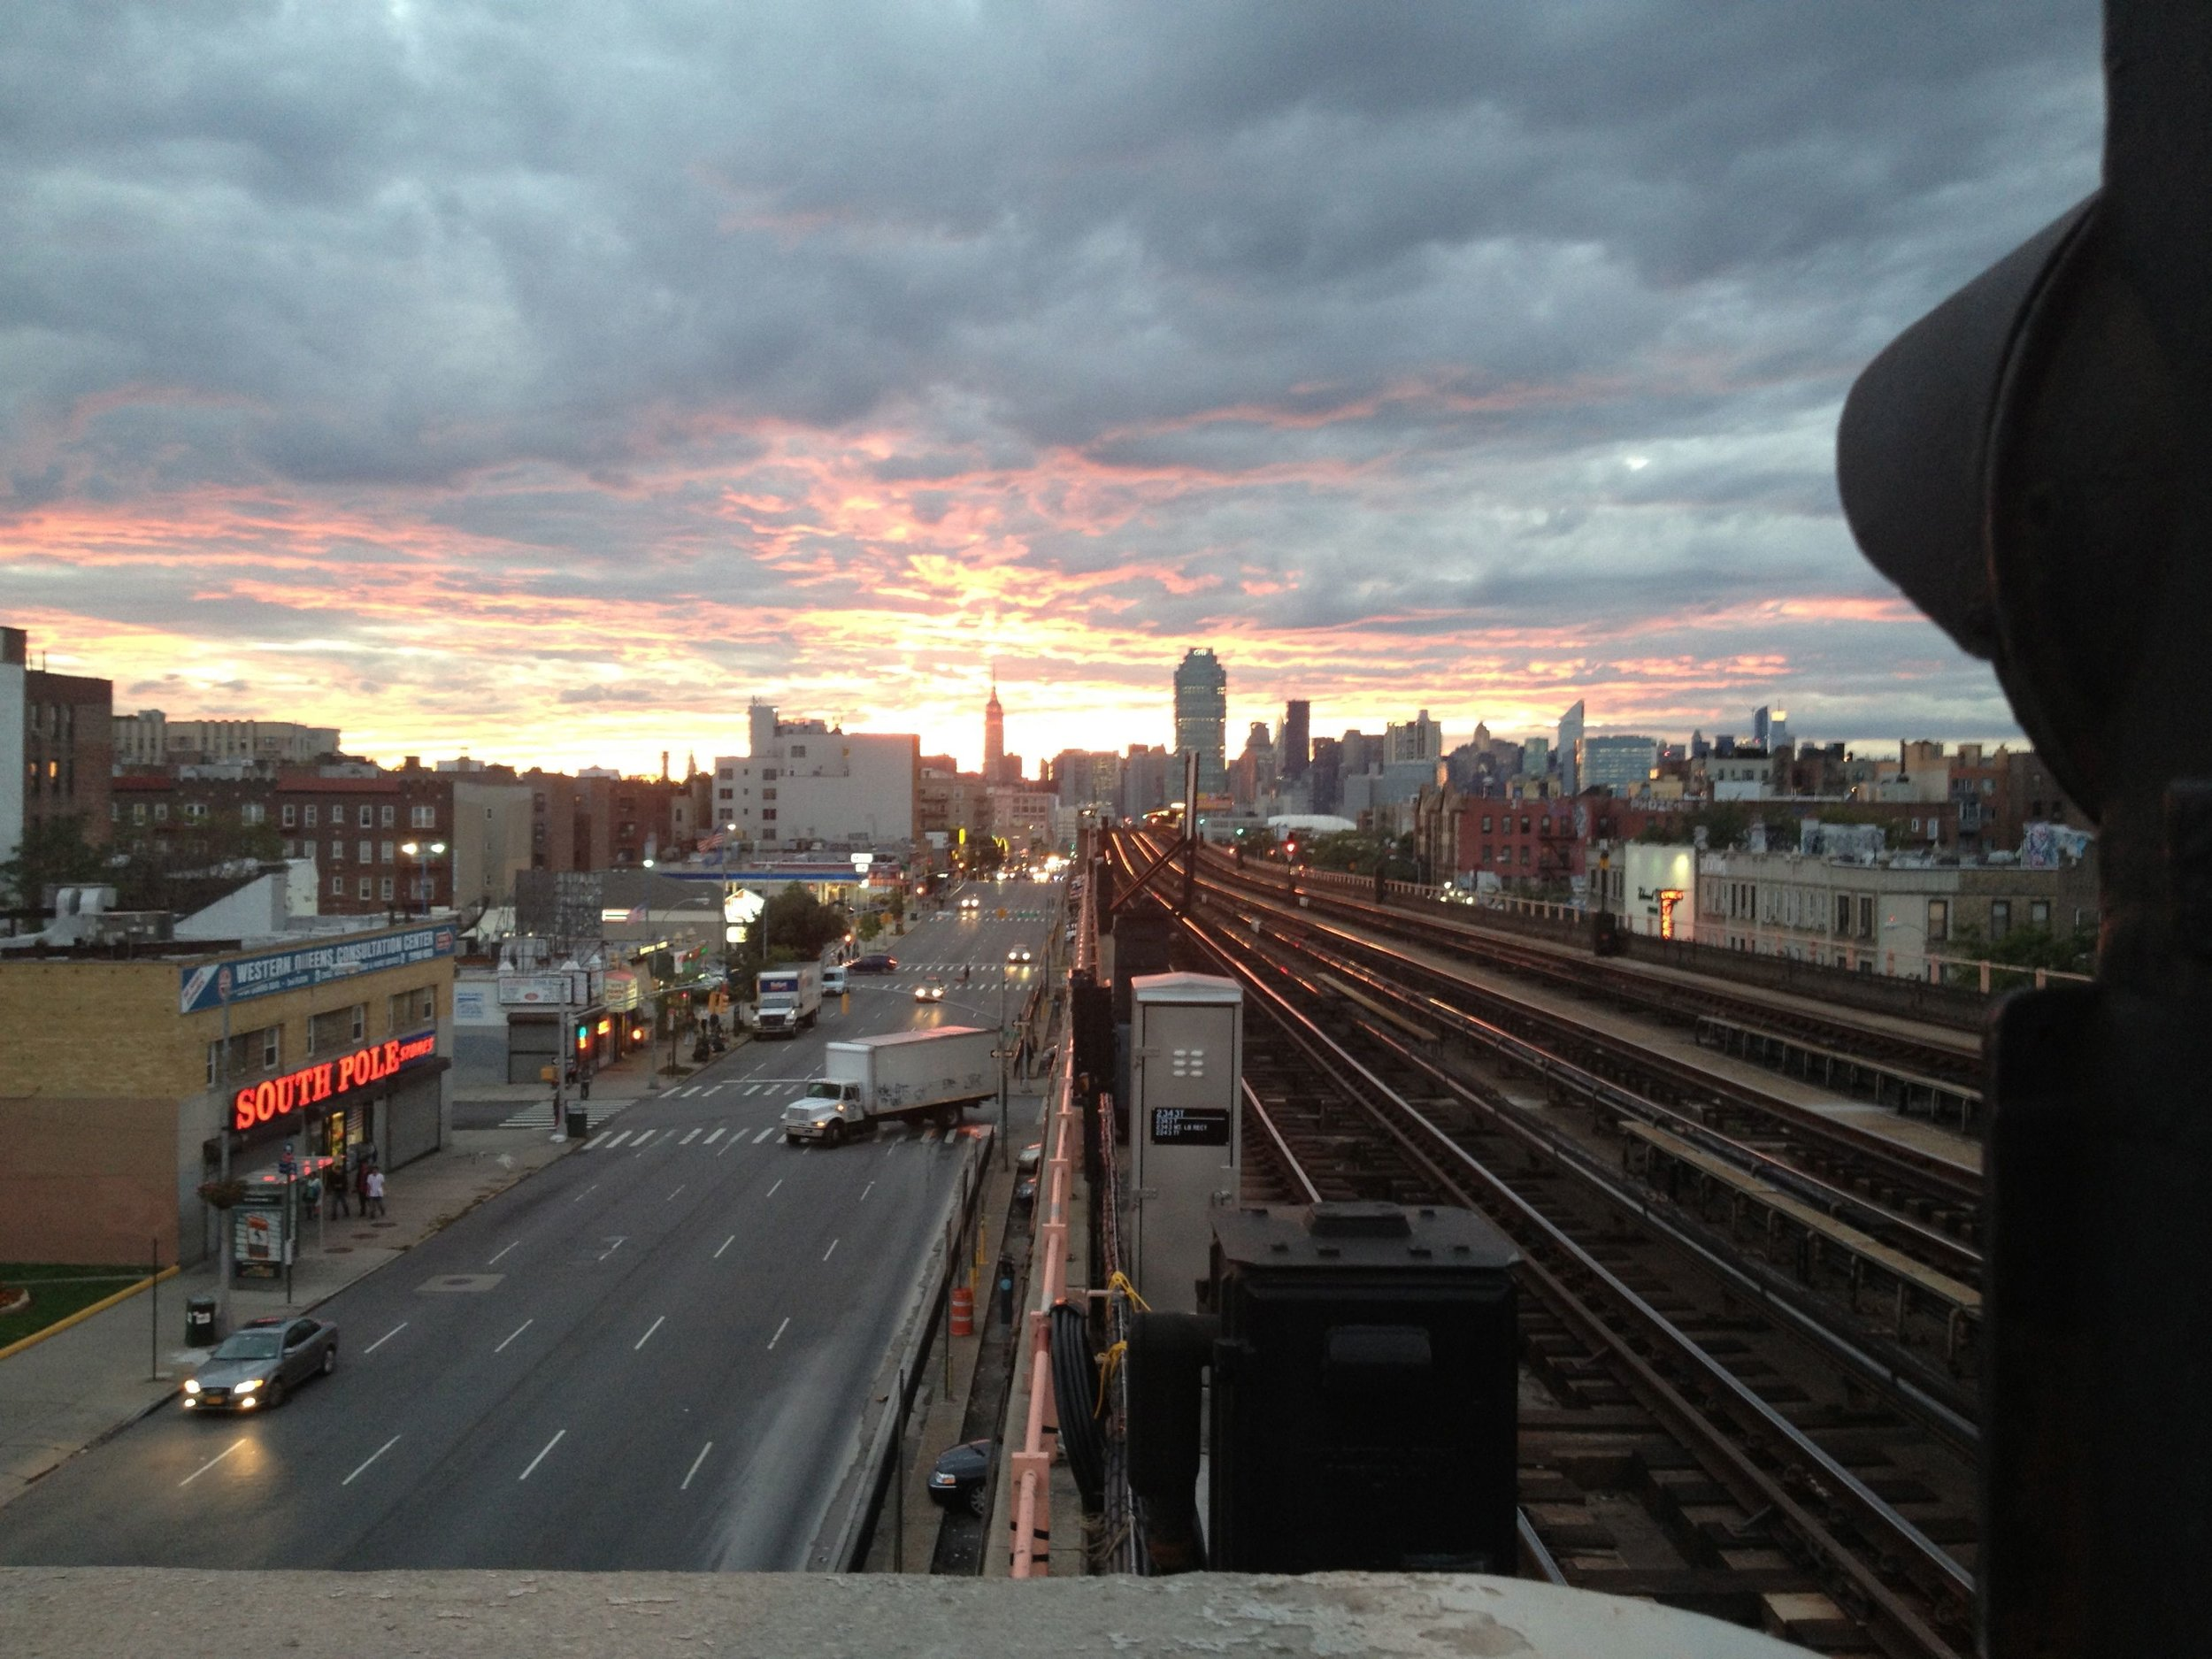 Sunset over Sunnyside, Queens